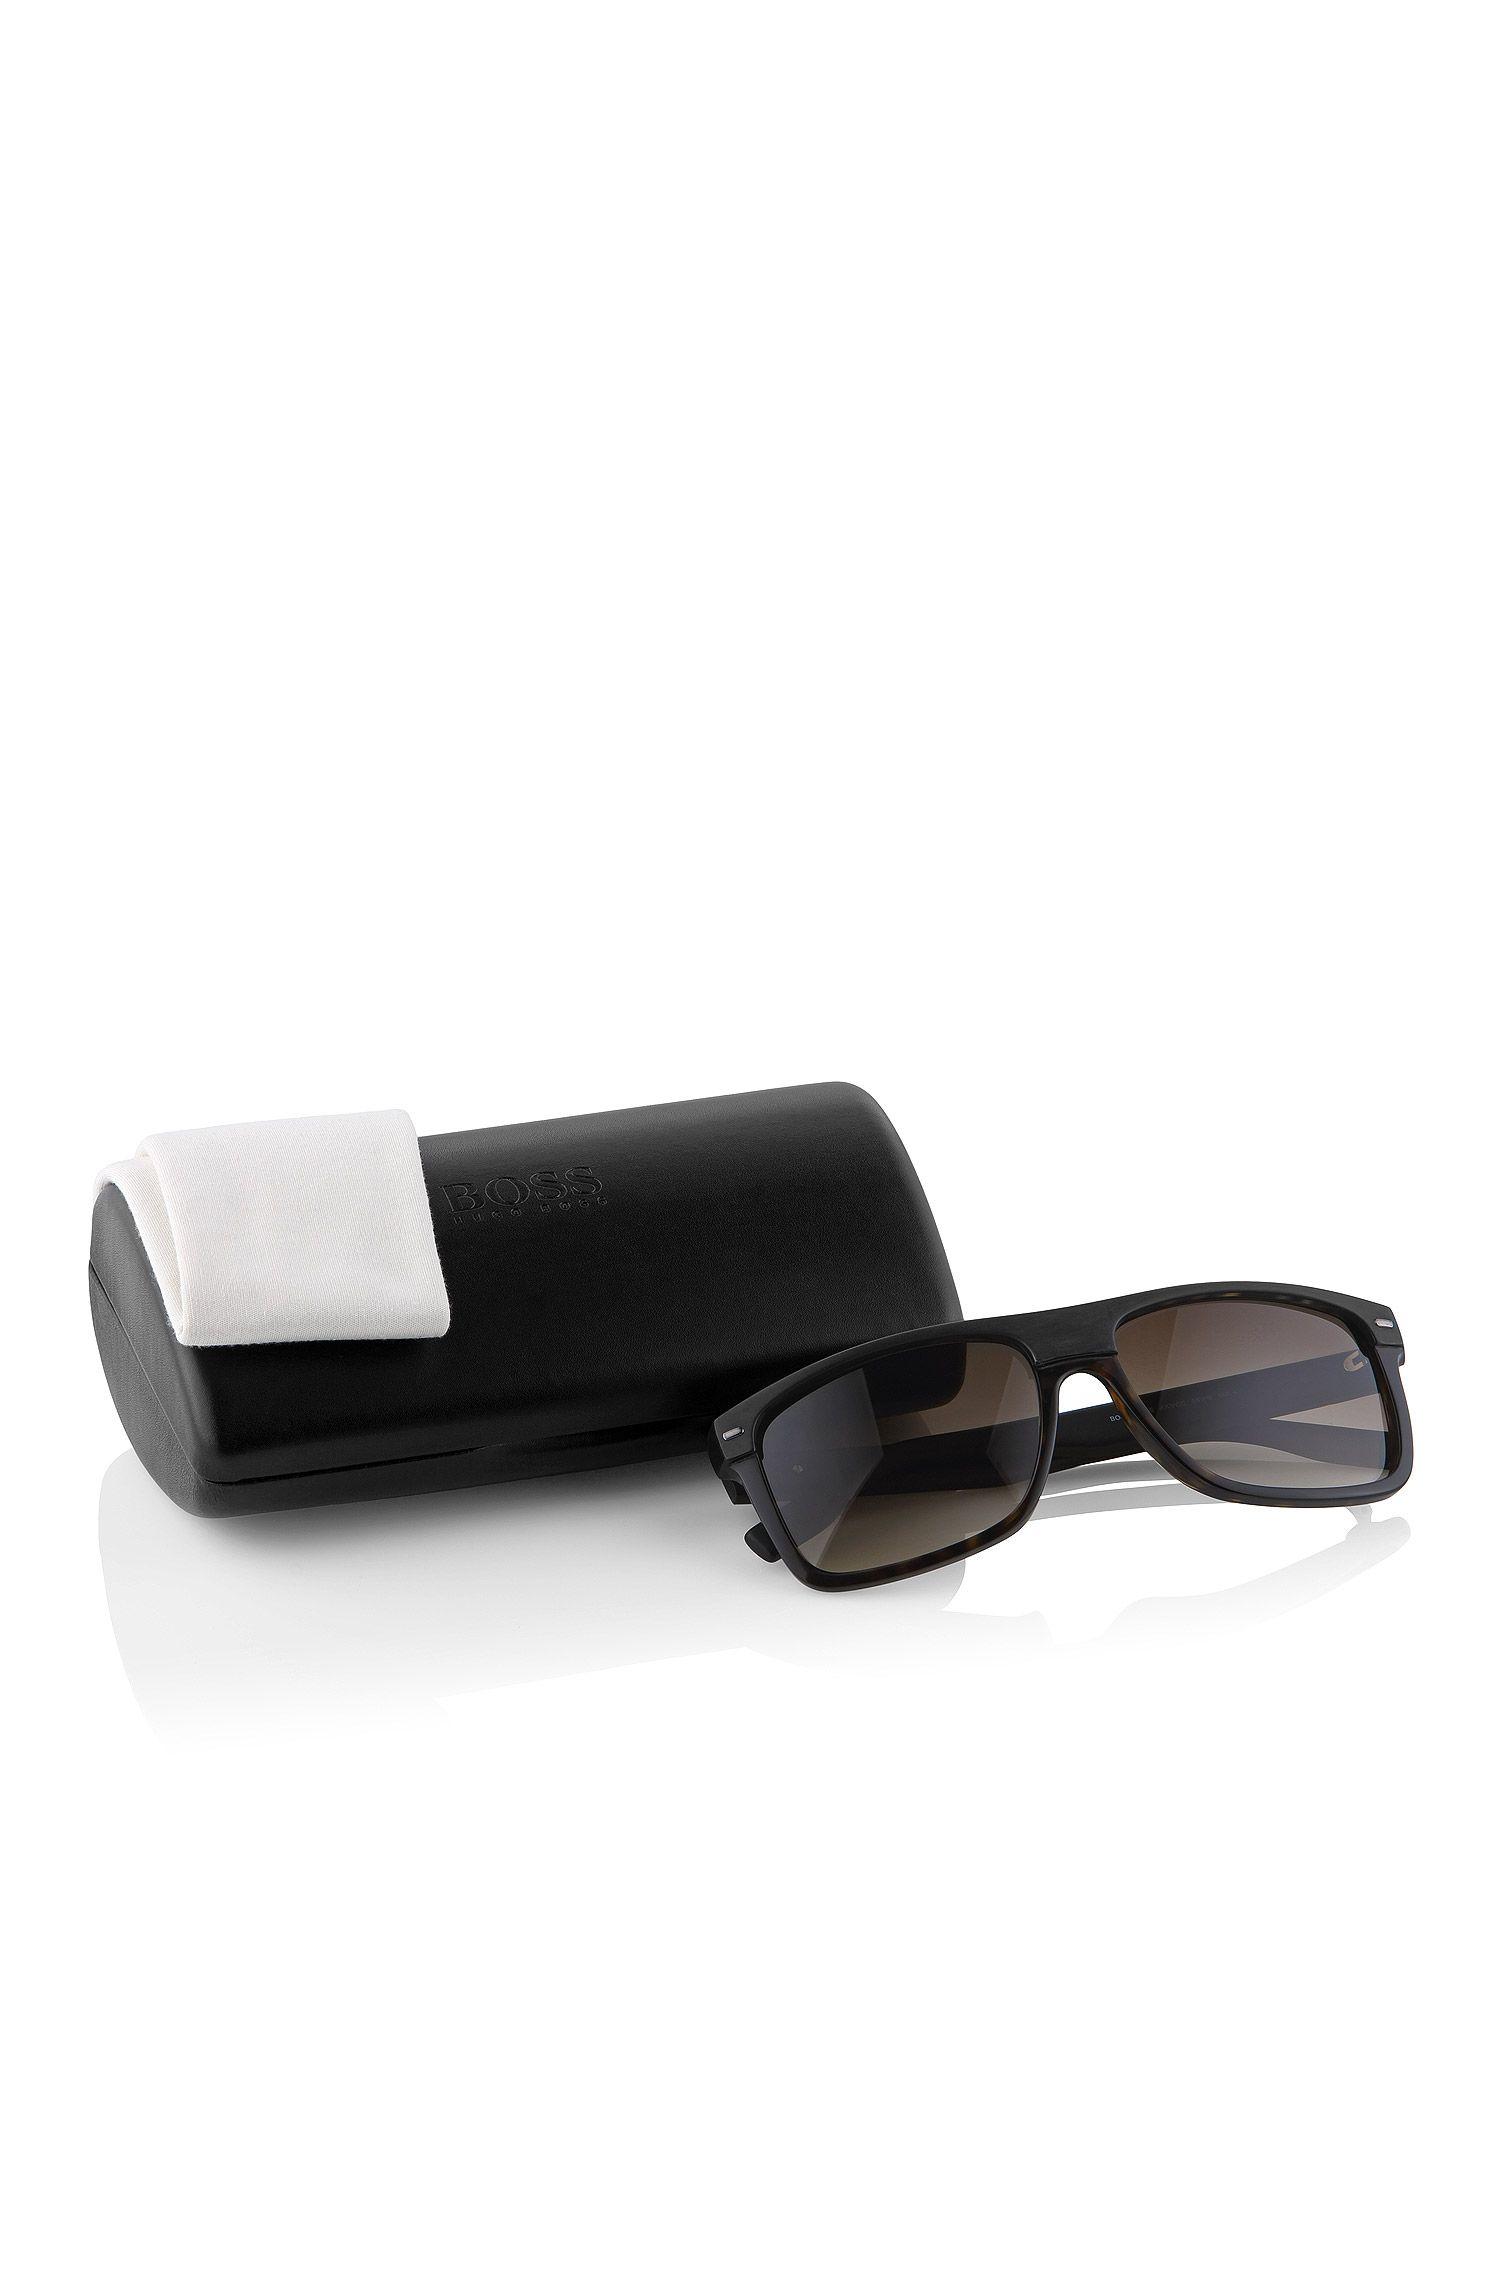 Piloten-Sonnenbrille Men ´BOSS 0517/S`